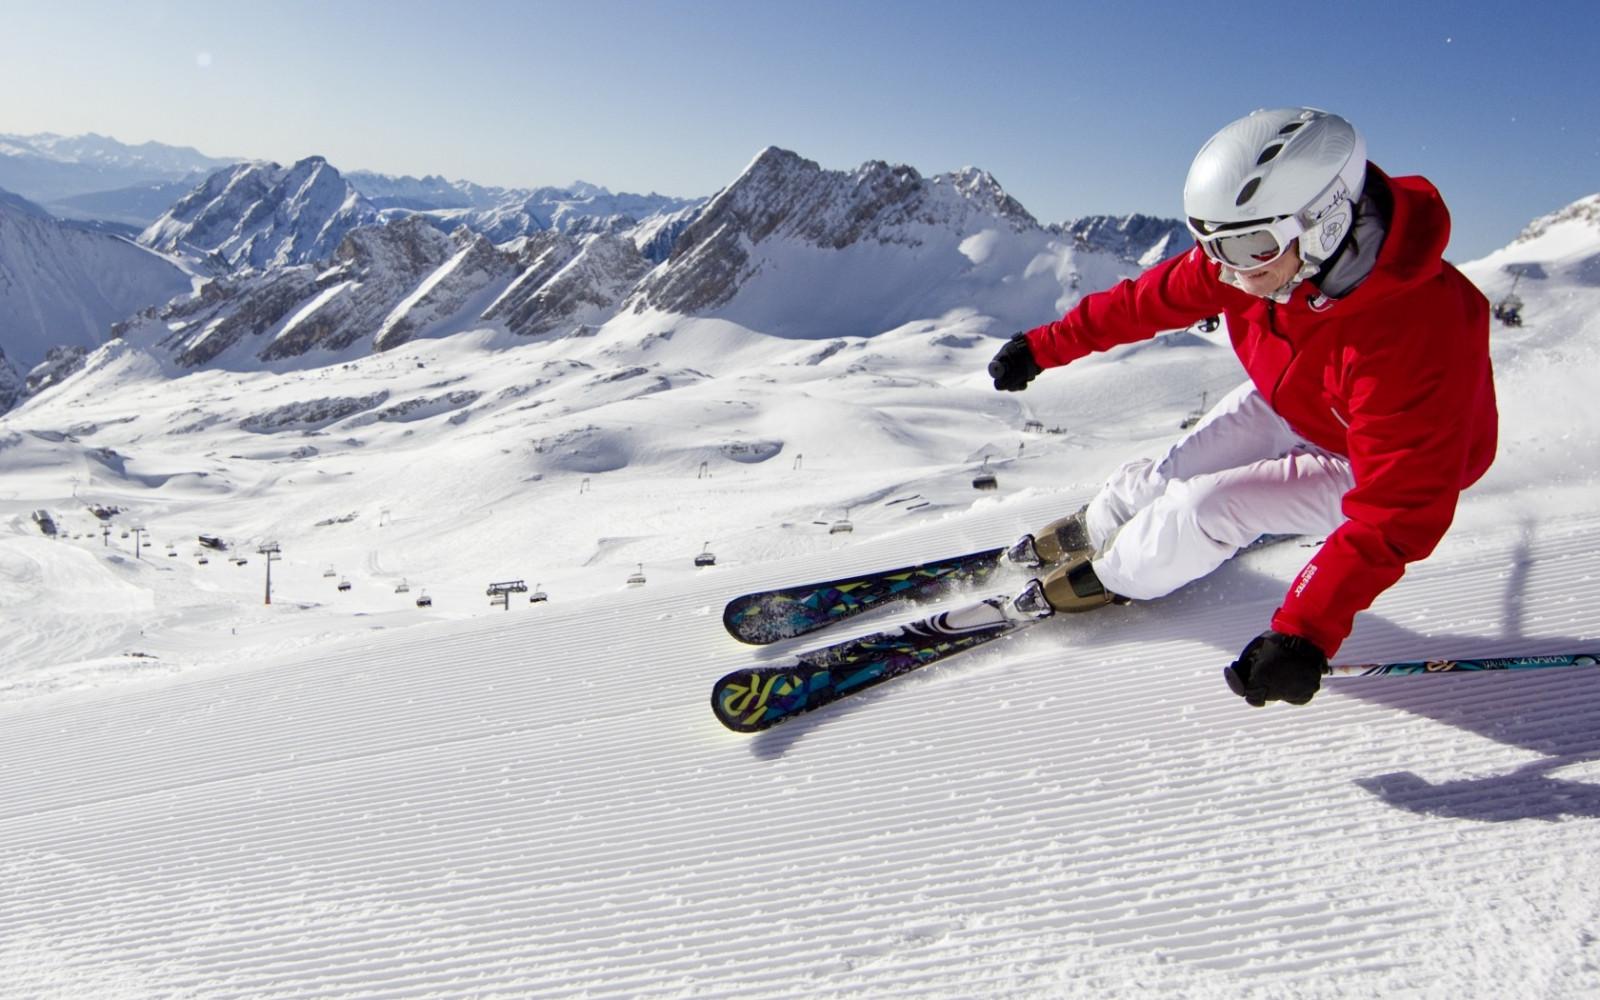 Fondos de pantalla deportes montañas nieve